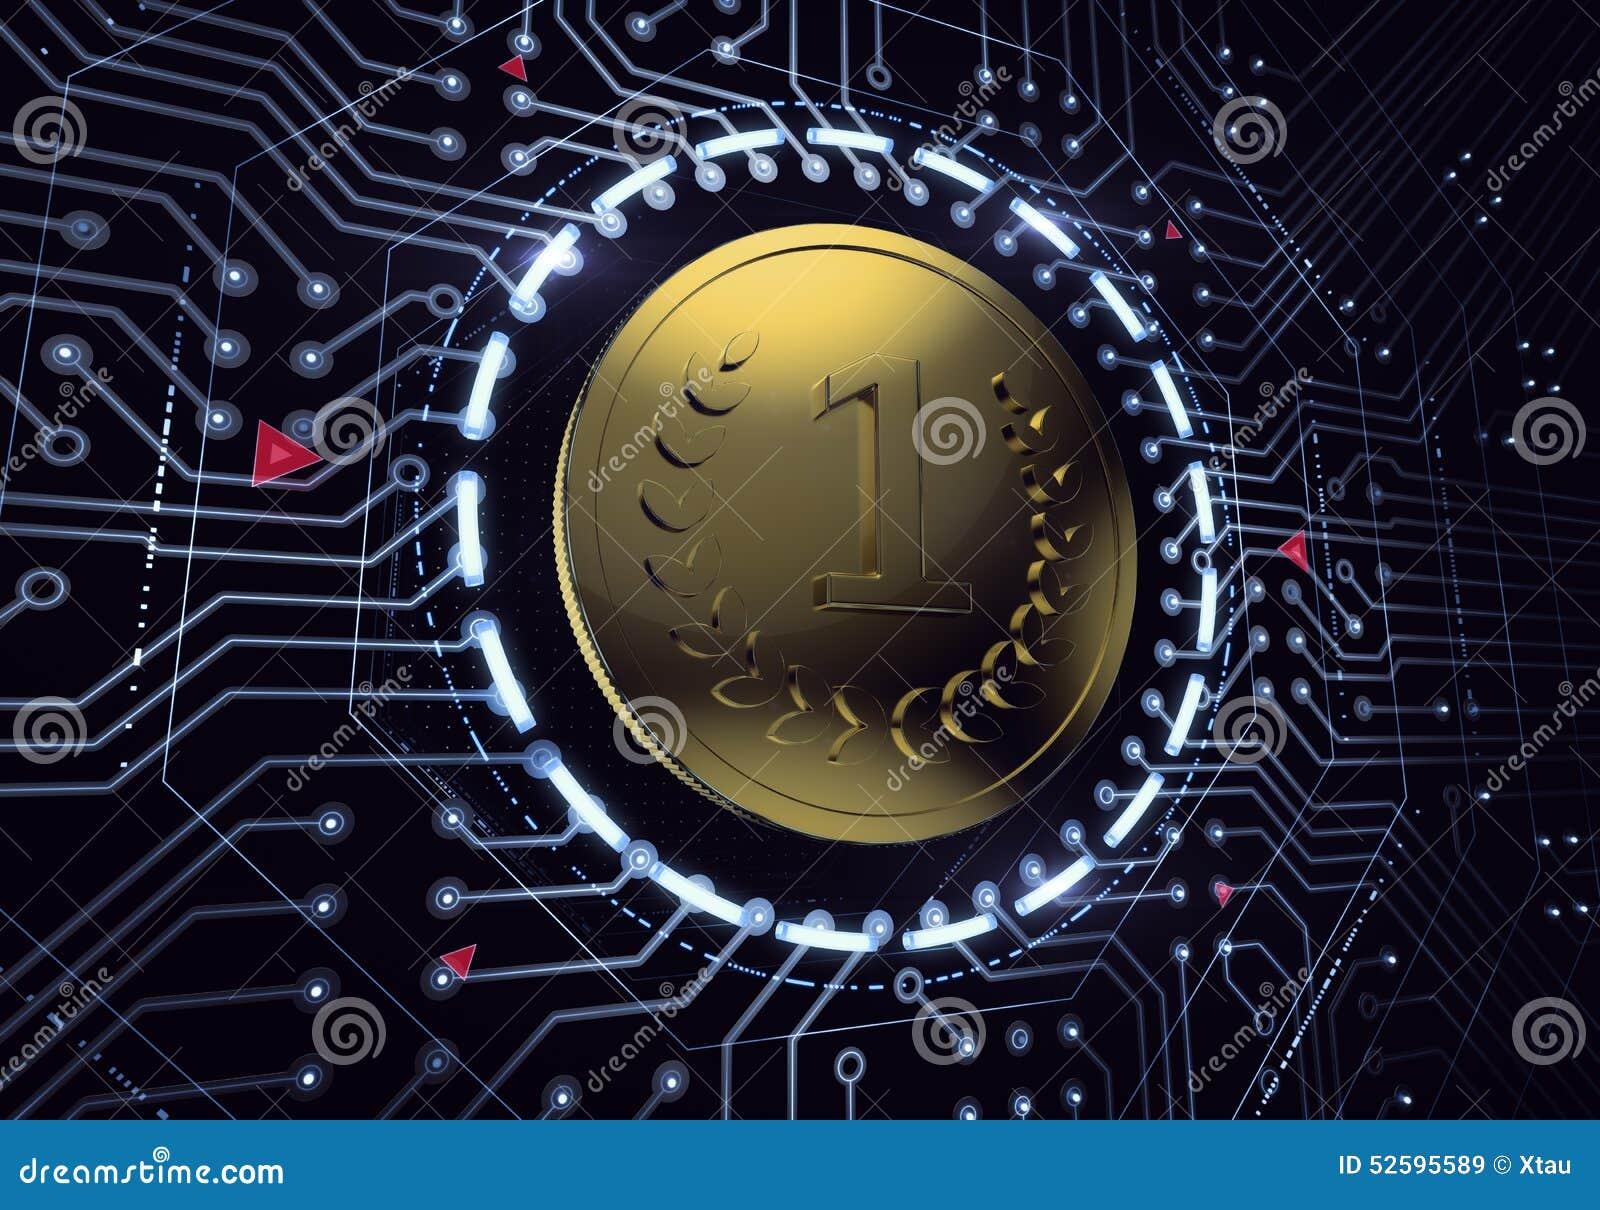 Resultado de imagen de digital object money identifier